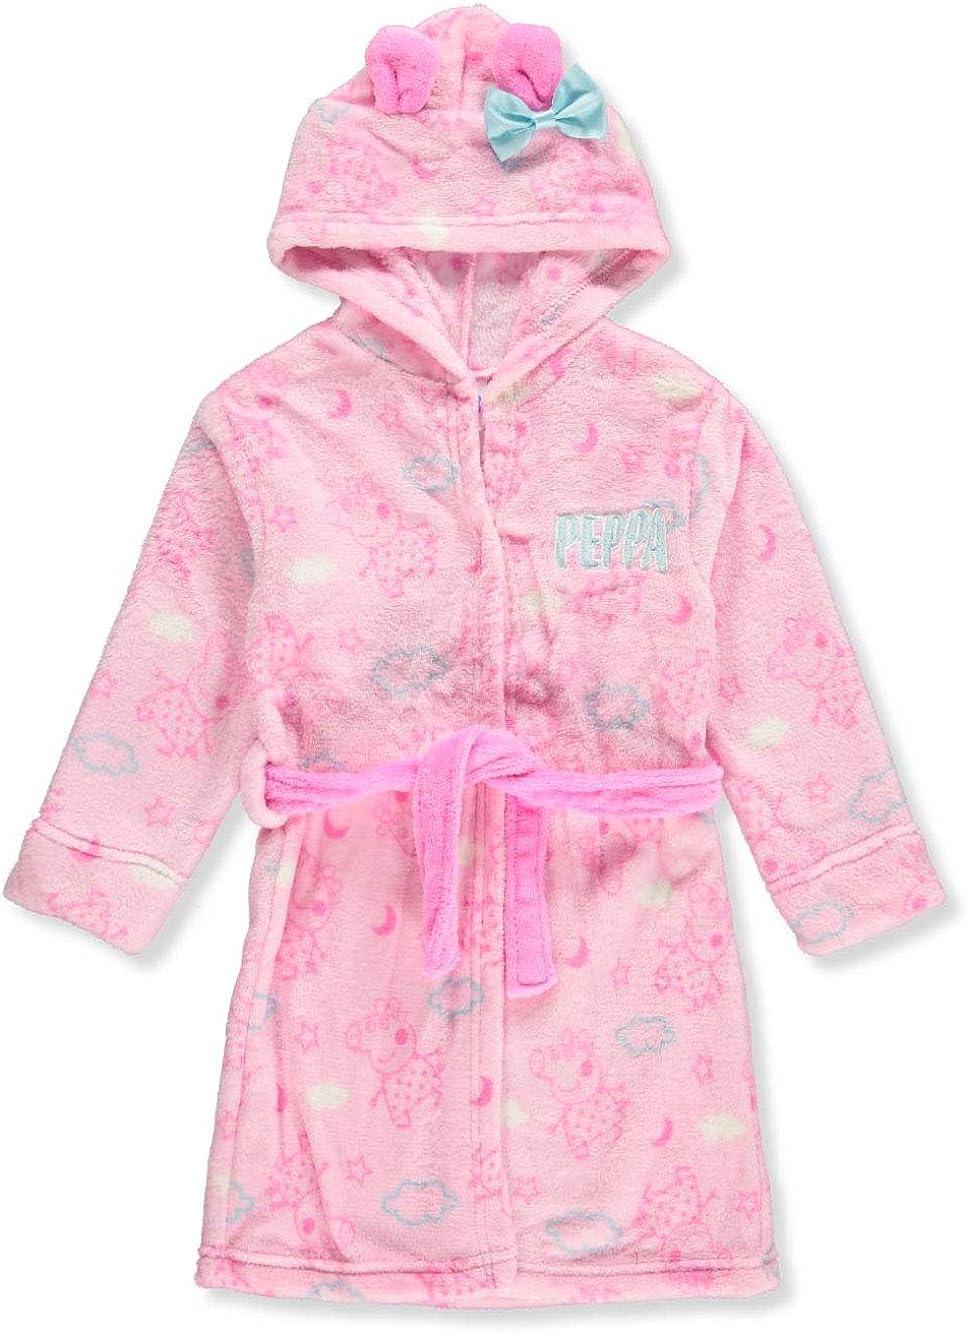 Size 4T Toddler Girls Bath Robe Peppa Pig Pink Soft Plush Little Girls Robe 4T Pink